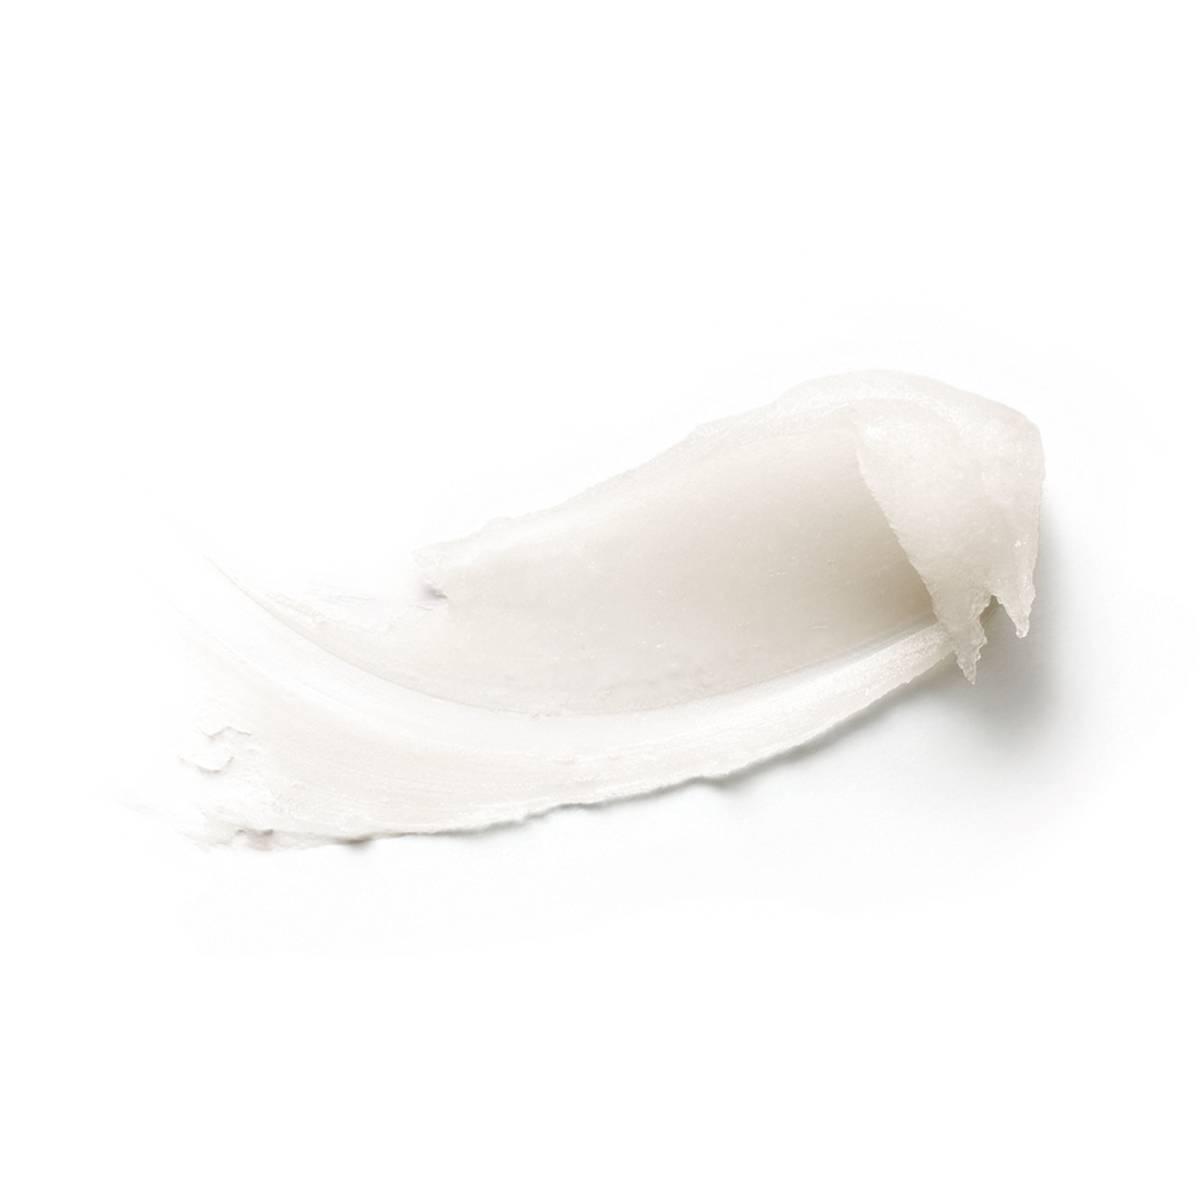 La Roche Posay Produktsida Småskador Cicaplast Lip Balm Texture